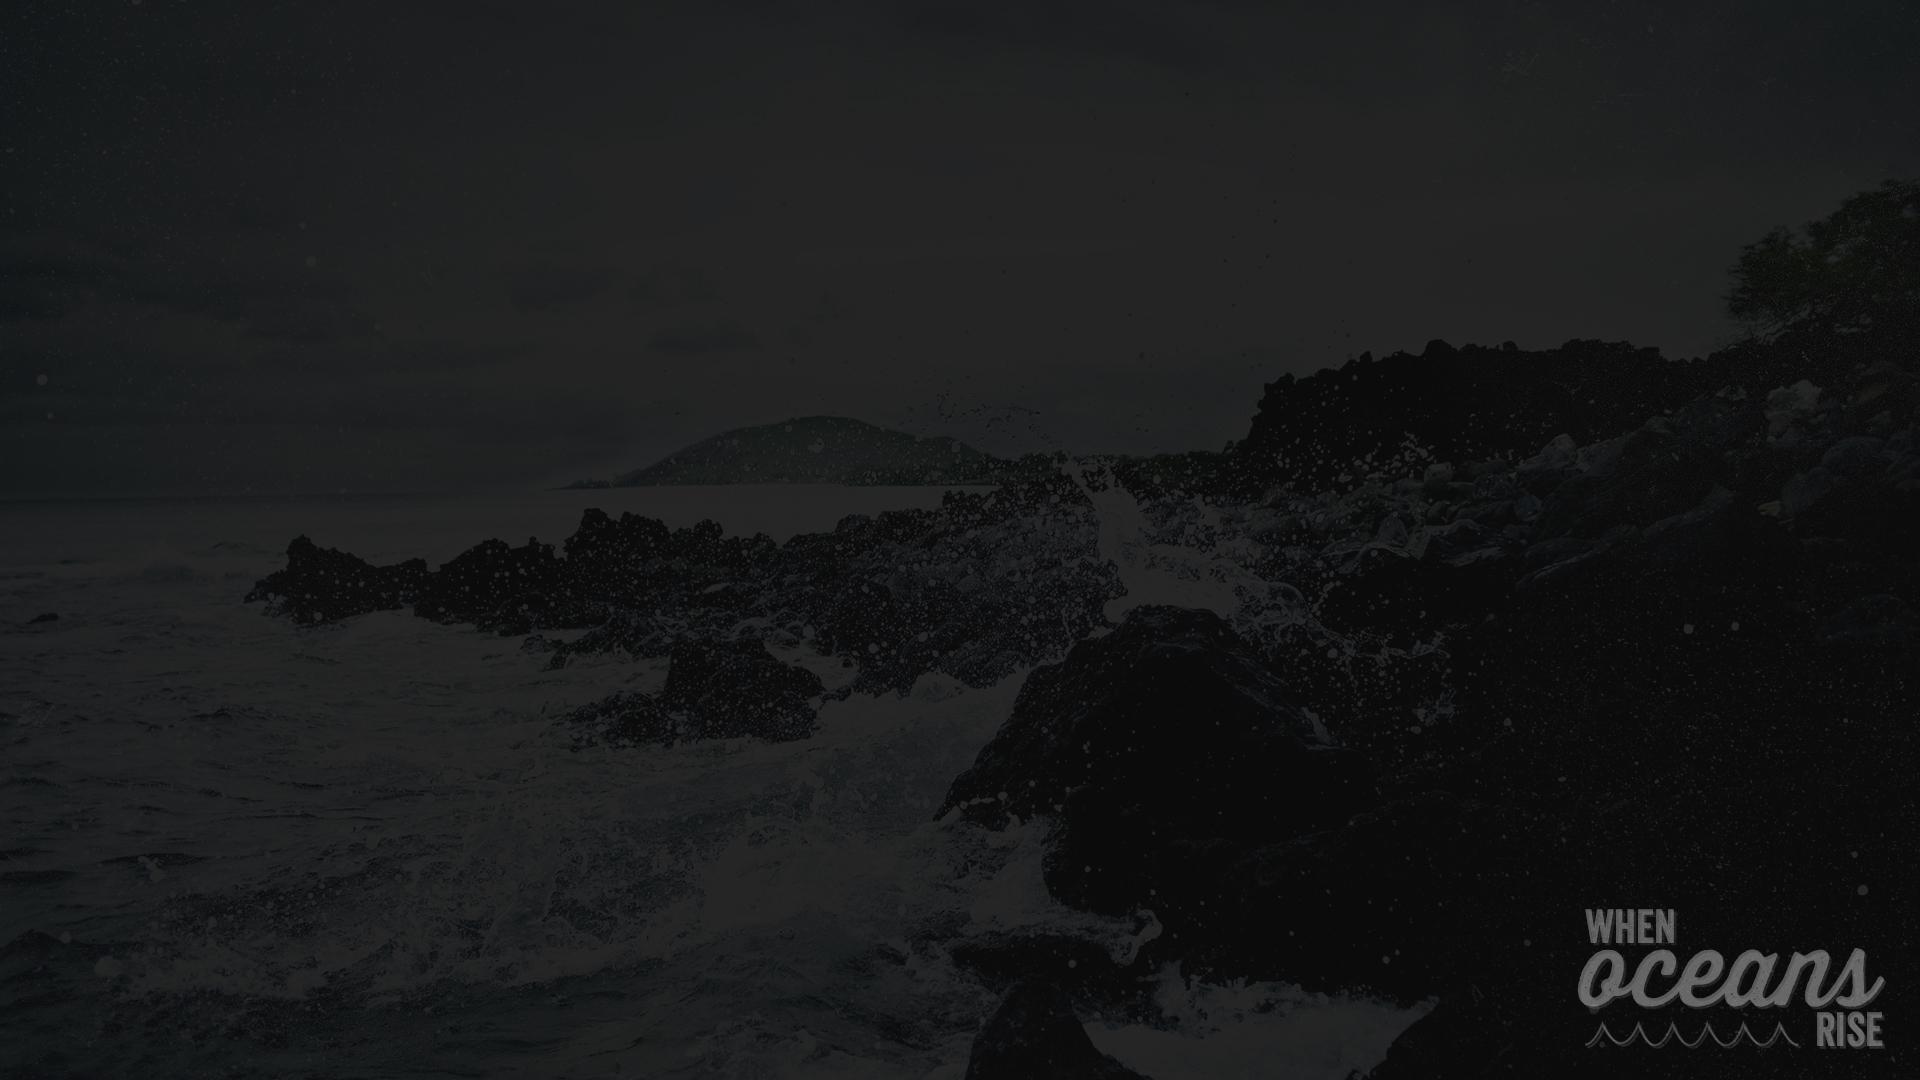 PLTFORM-WhenOceansRise-Text.jpg